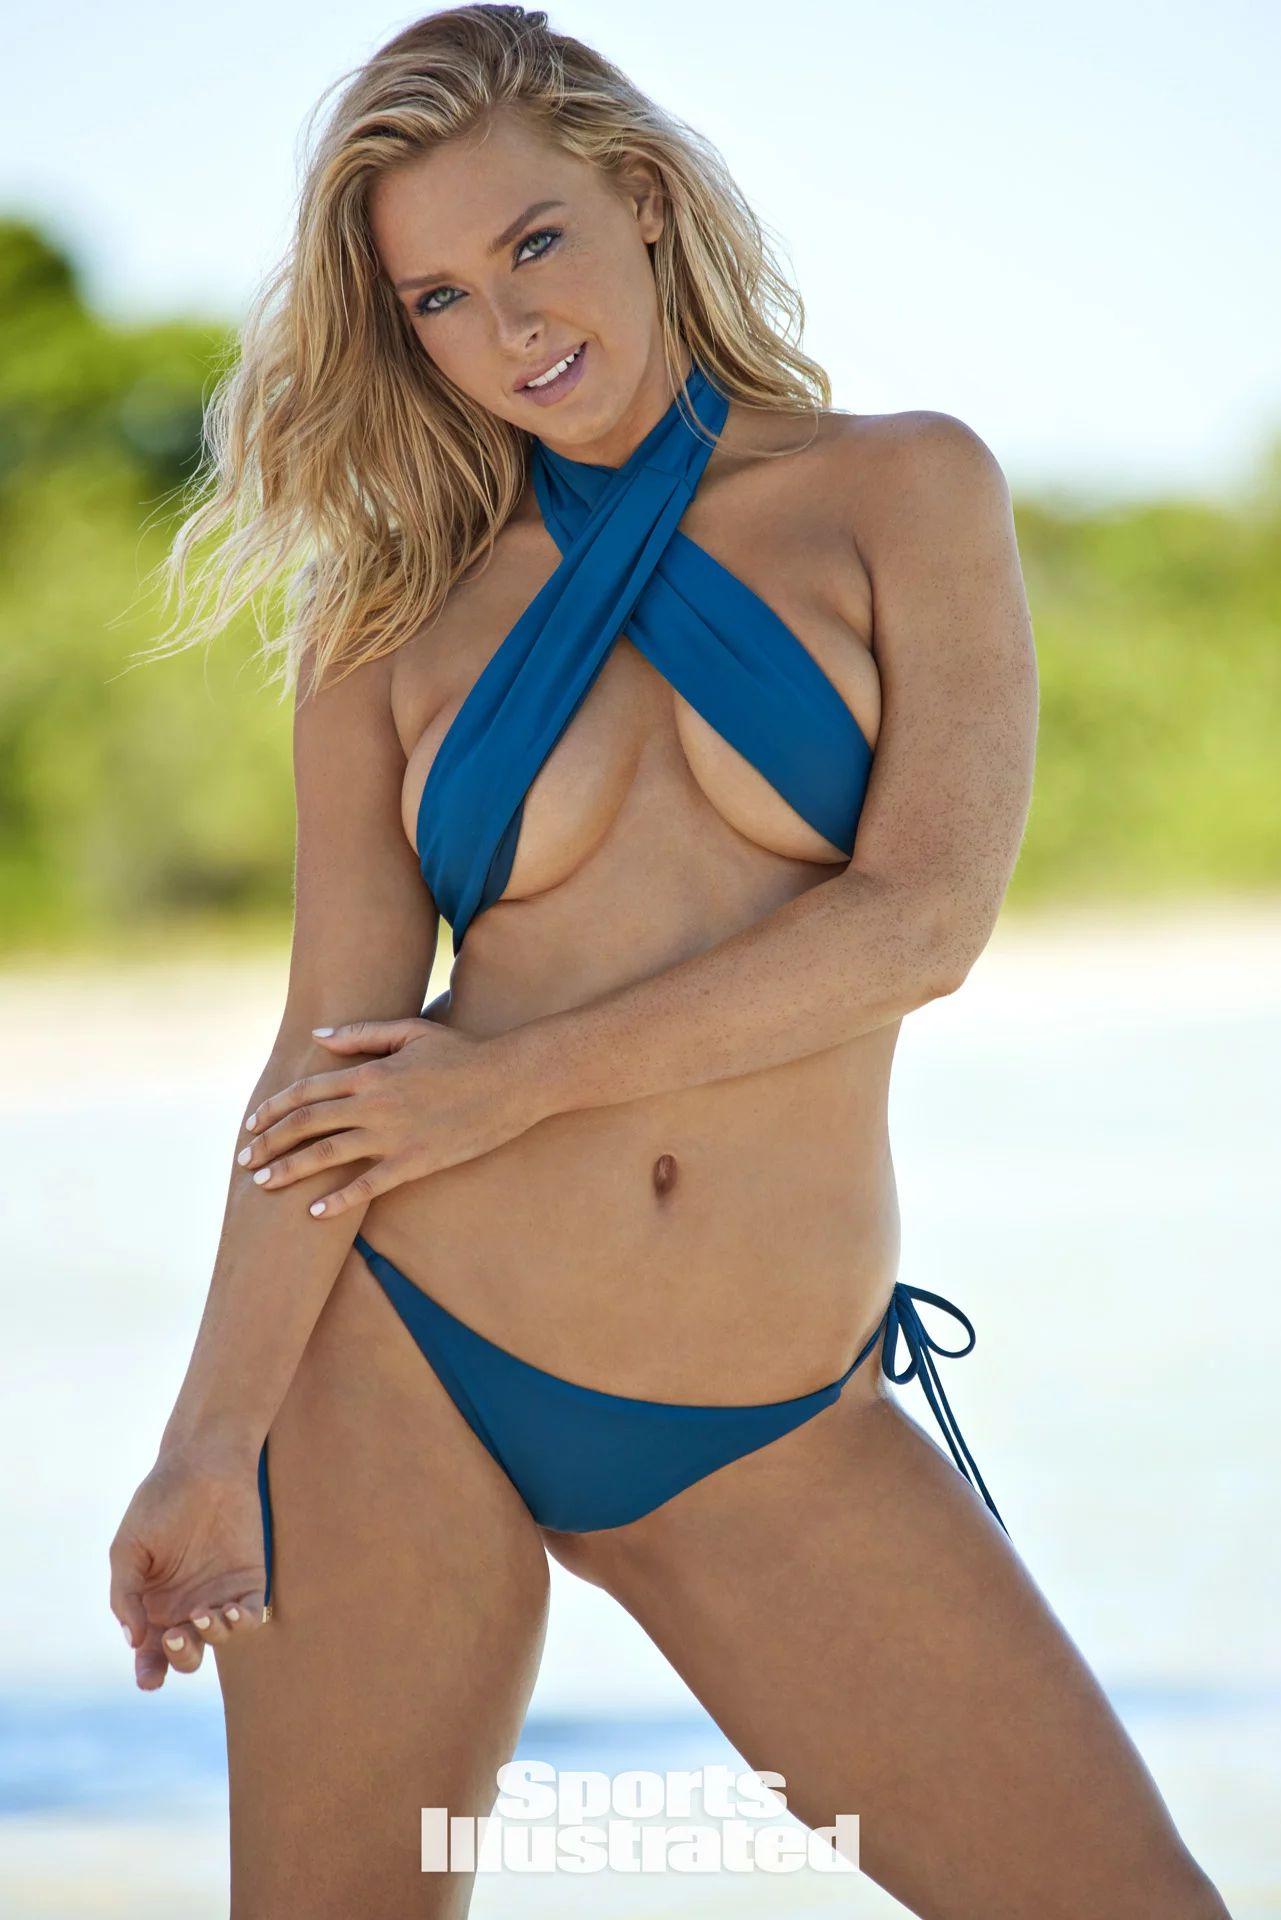 XXX Camille Kostek nudes (68 photos), Ass, Cleavage, Instagram, in bikini 2015